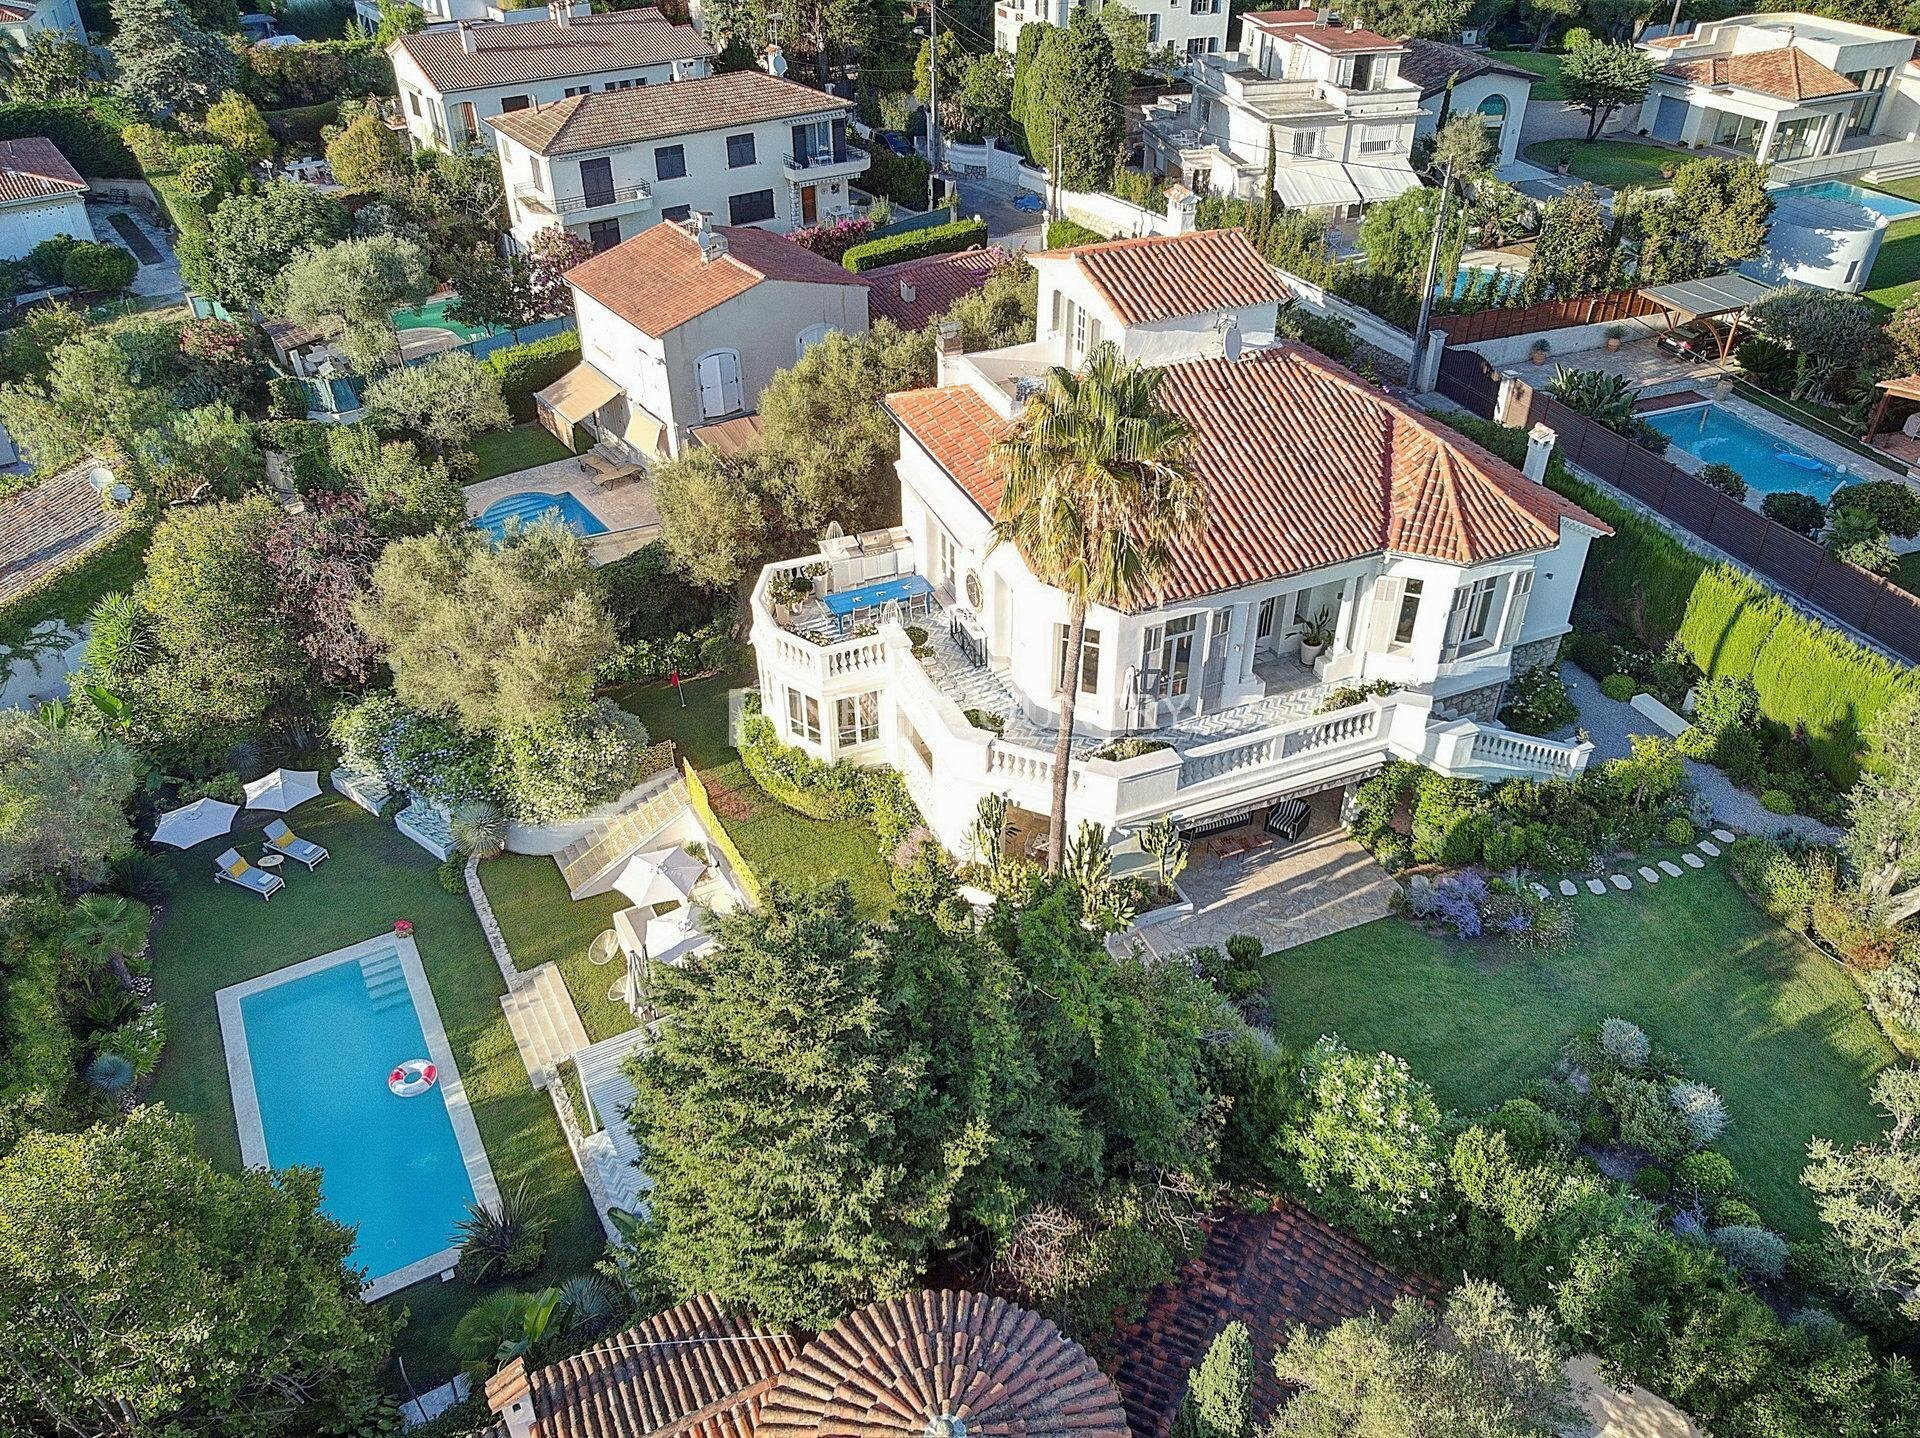 Villa in Antibes, Provence-Alpes-Côte d'Azur, France 1 - 11126933